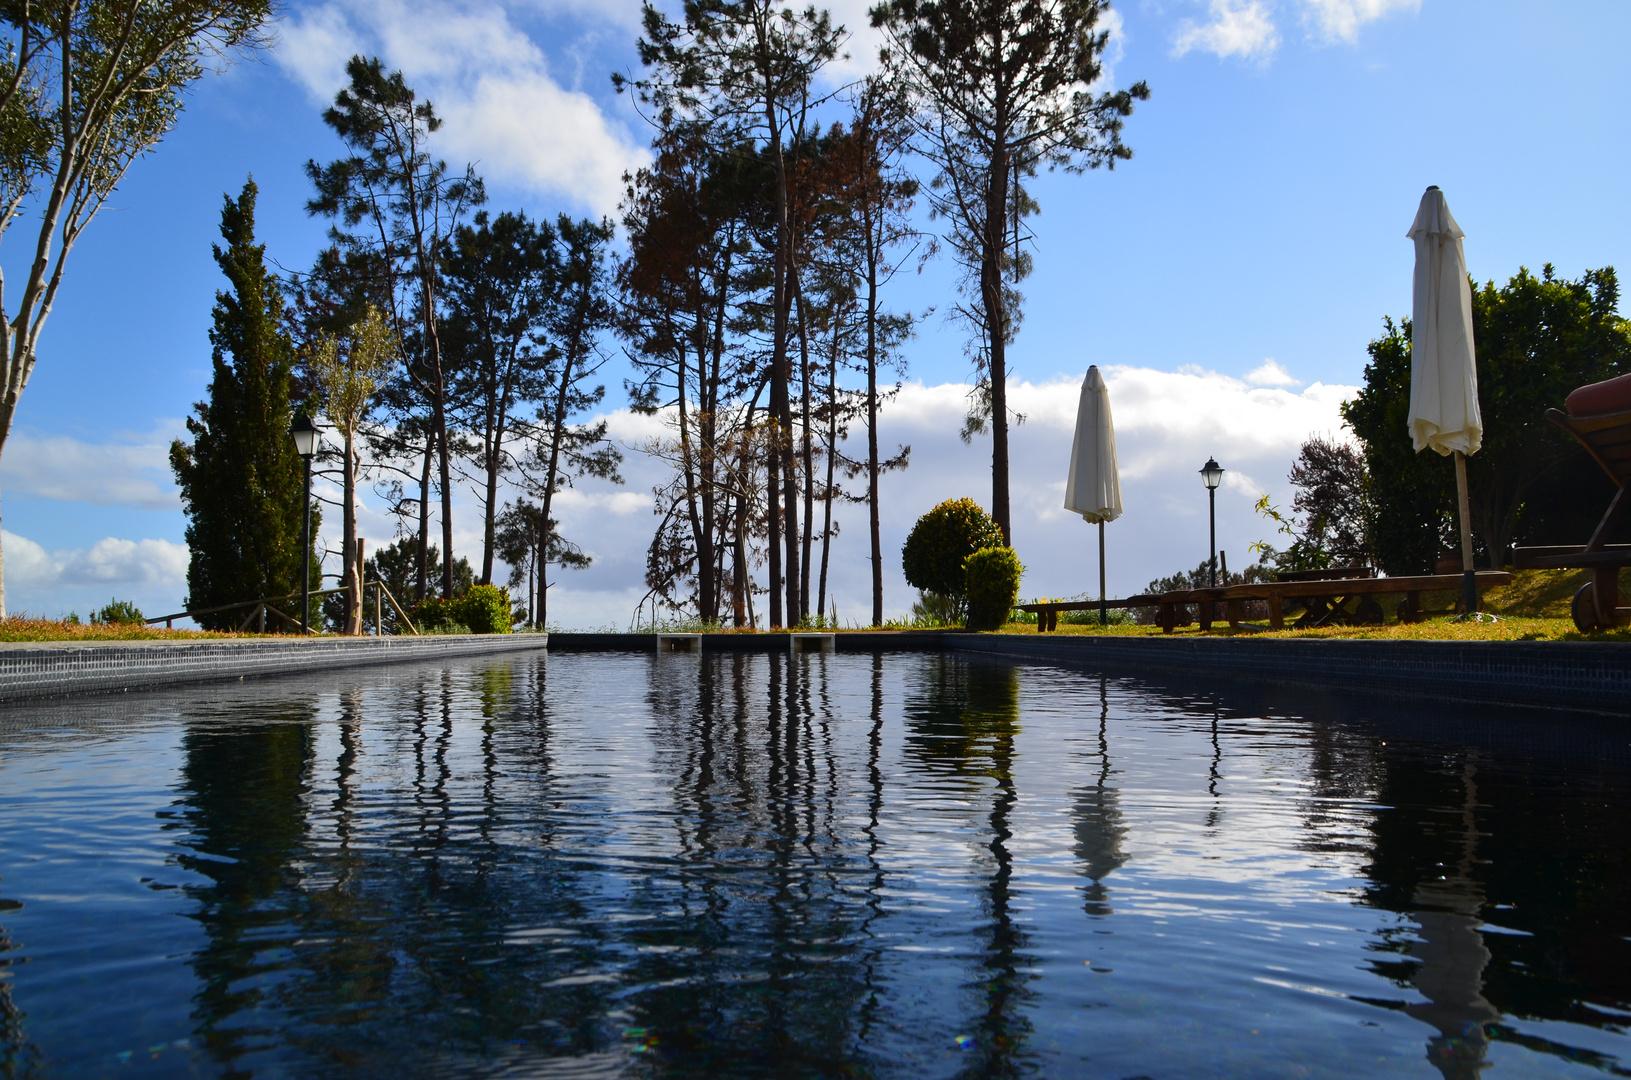 Pool Hotel Atrio, Madeira, Portugal